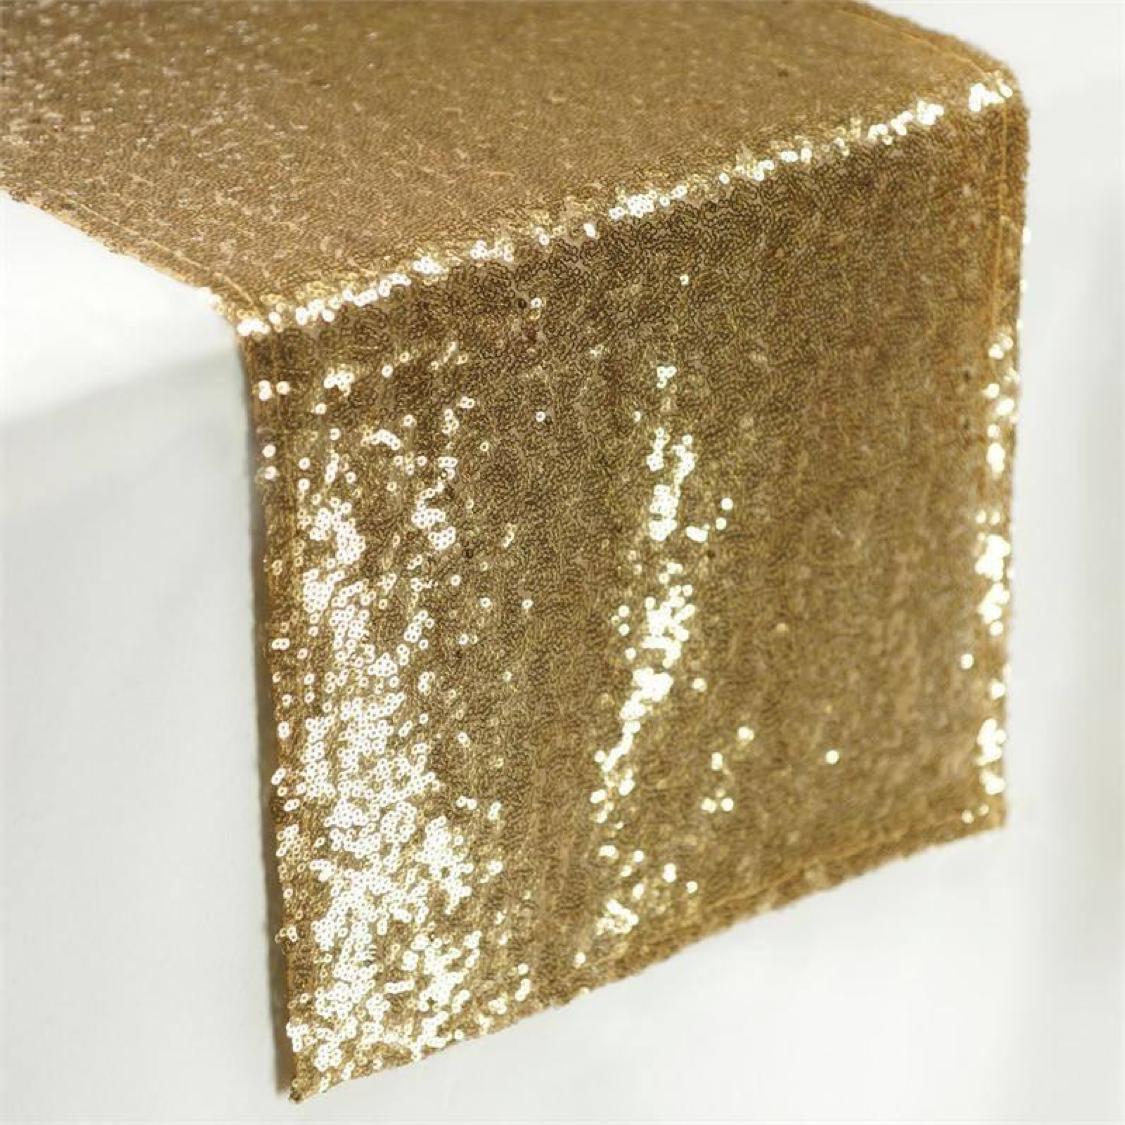 GOLD SEQUIN TABLE RUNNER (2.4 M L)  $12+GST